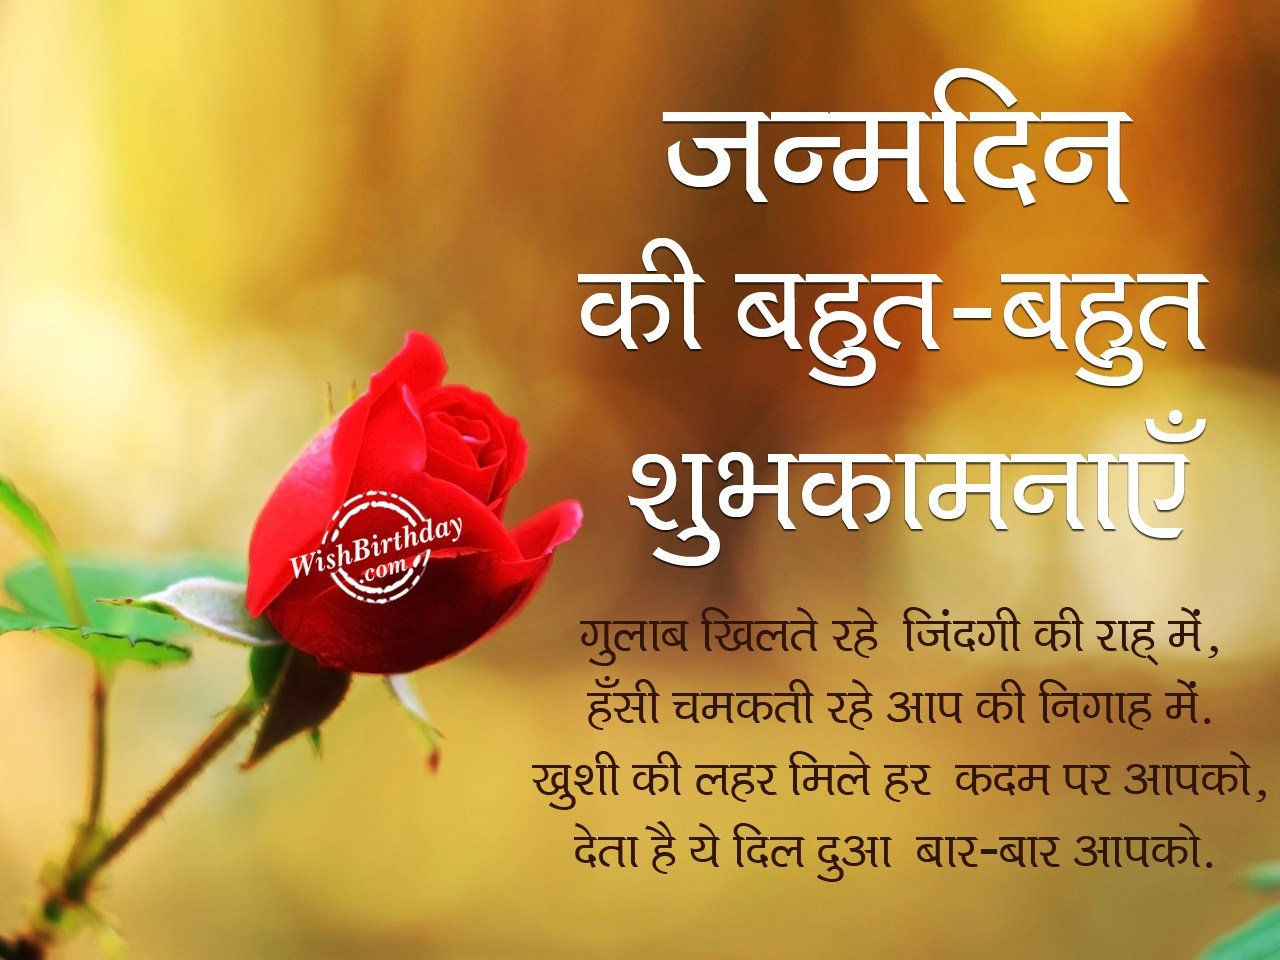 Birthday wishes hindi images boory birthday wishes in hindi birthday cards greetings m4hsunfo